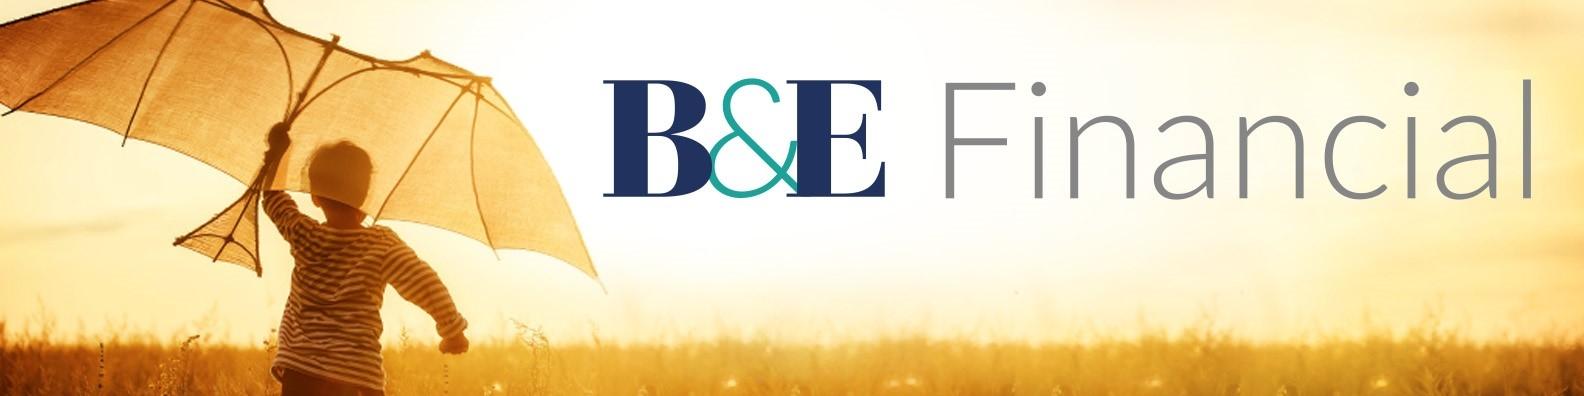 B&E Financial